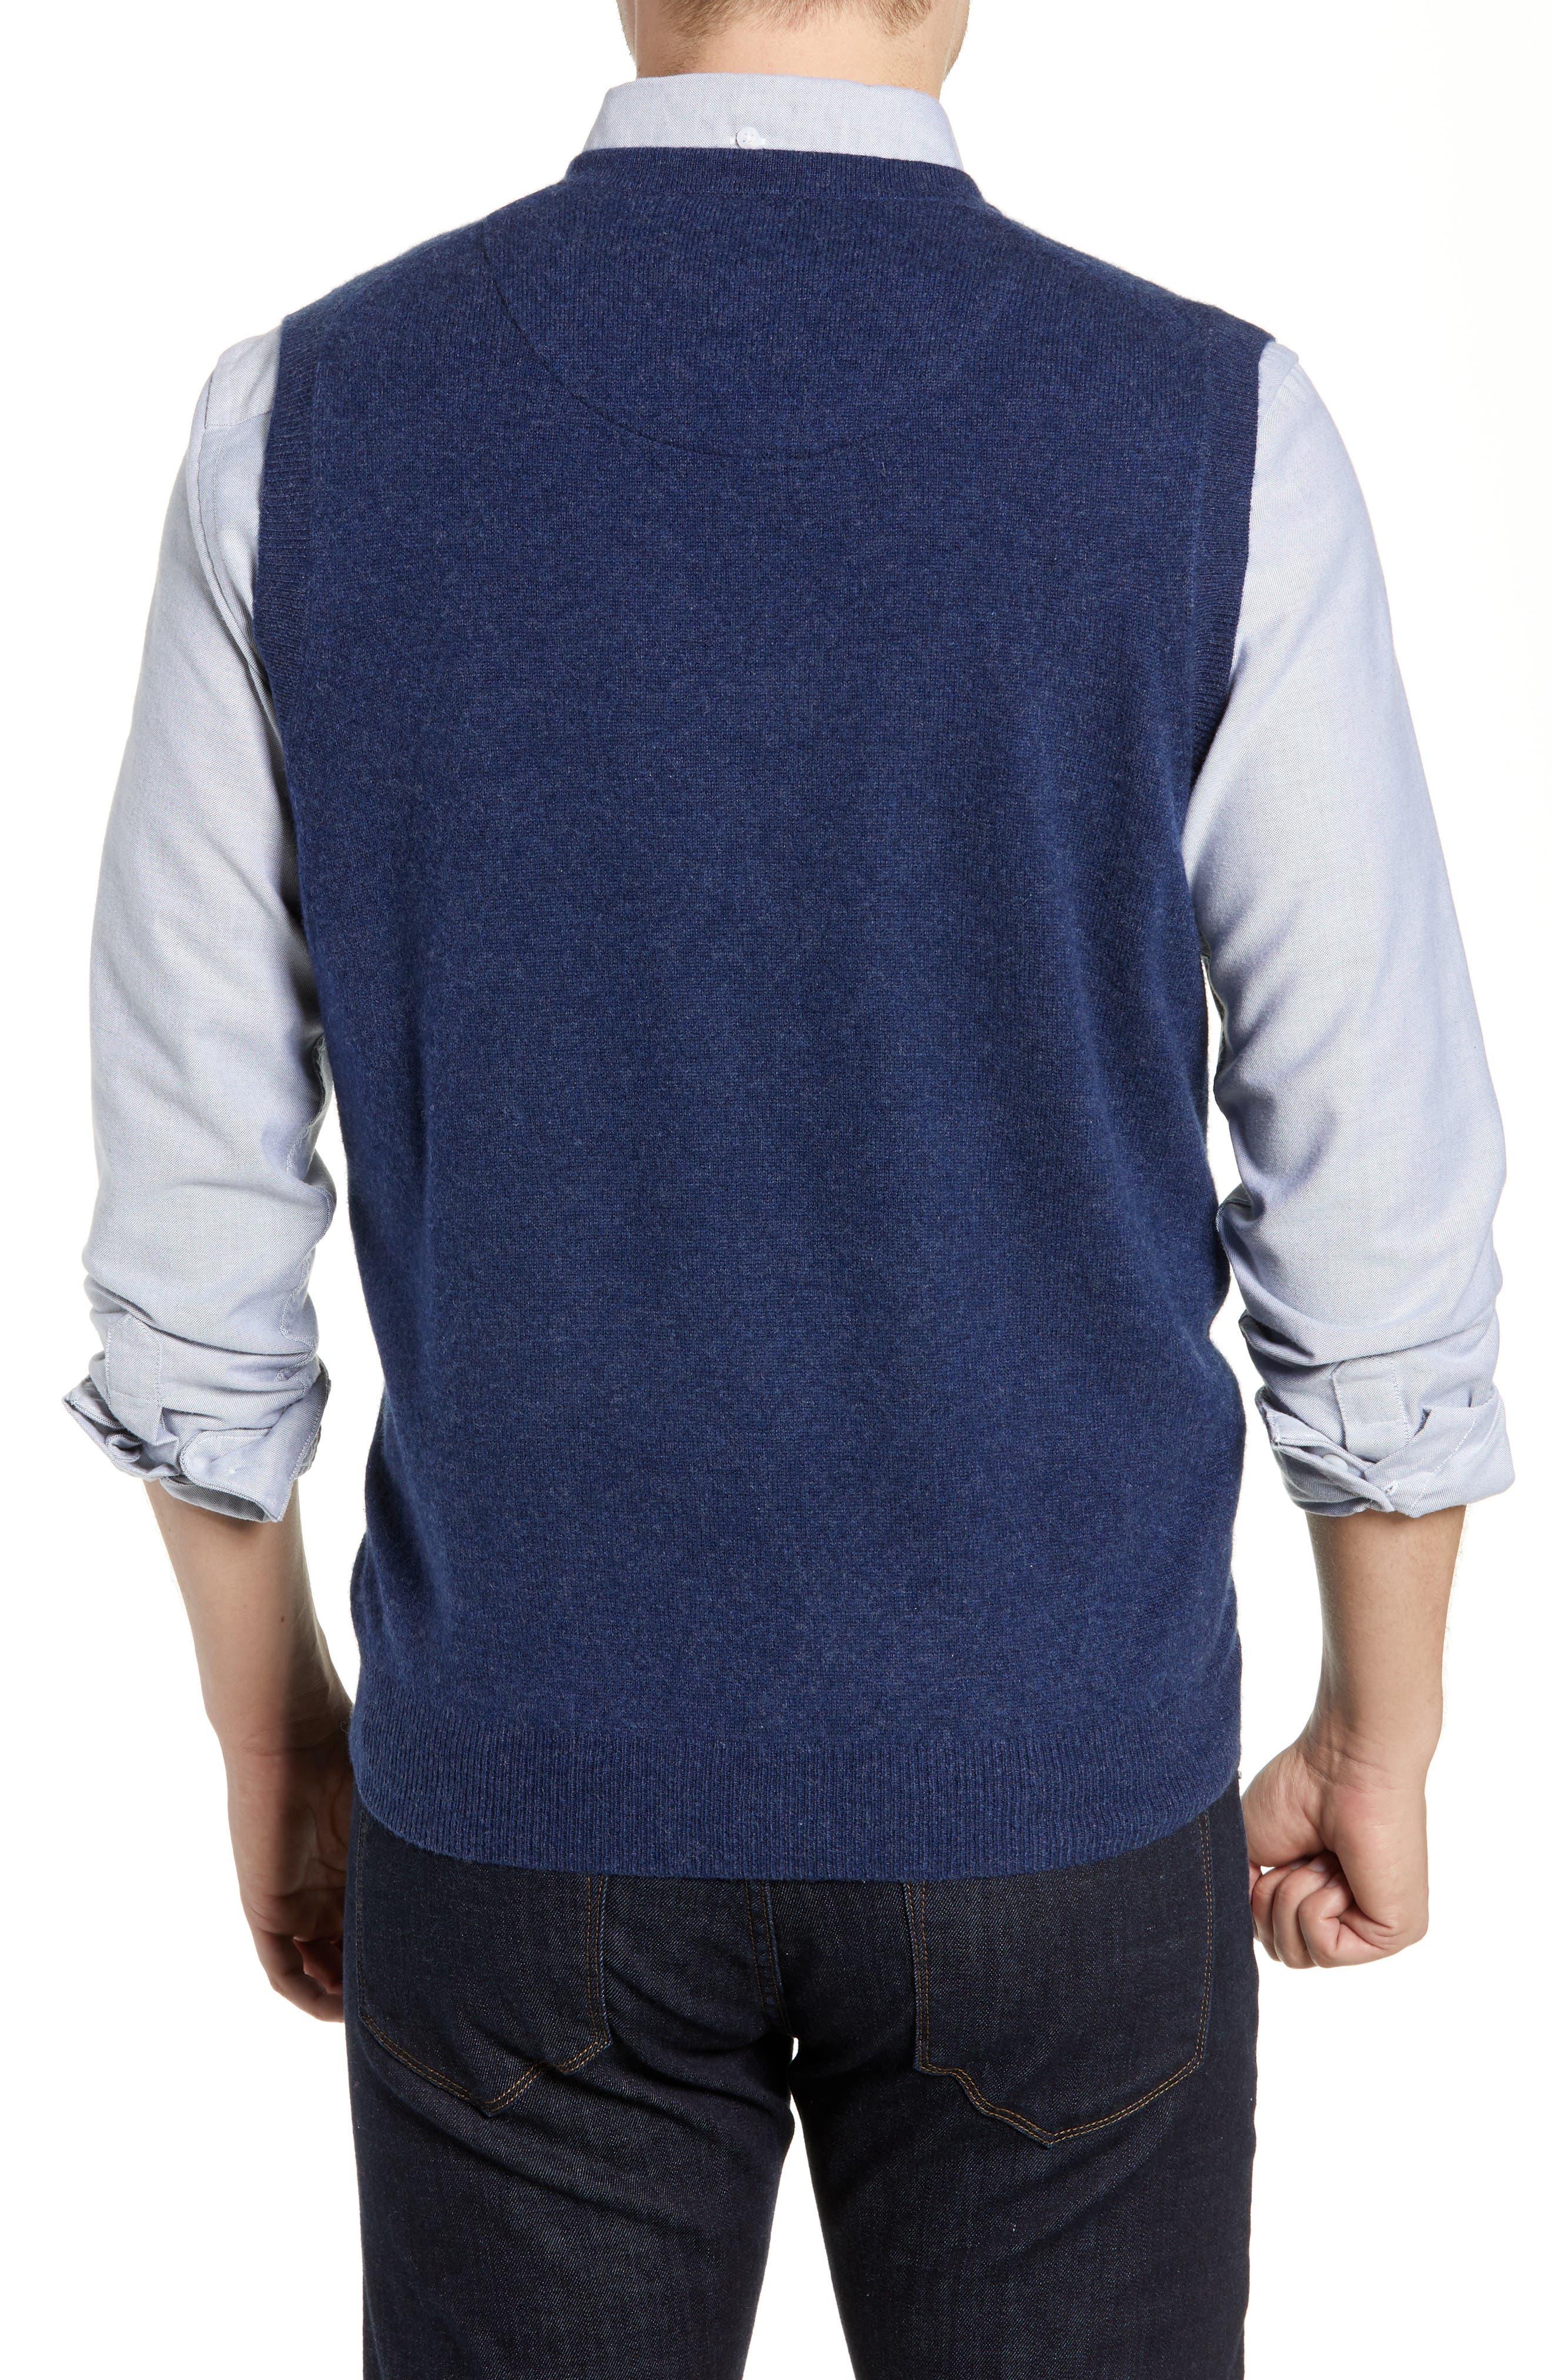 Cashmere V-Neck Sweater Vest,                             Alternate thumbnail 2, color,                             BLUE ESTATE HEATHER